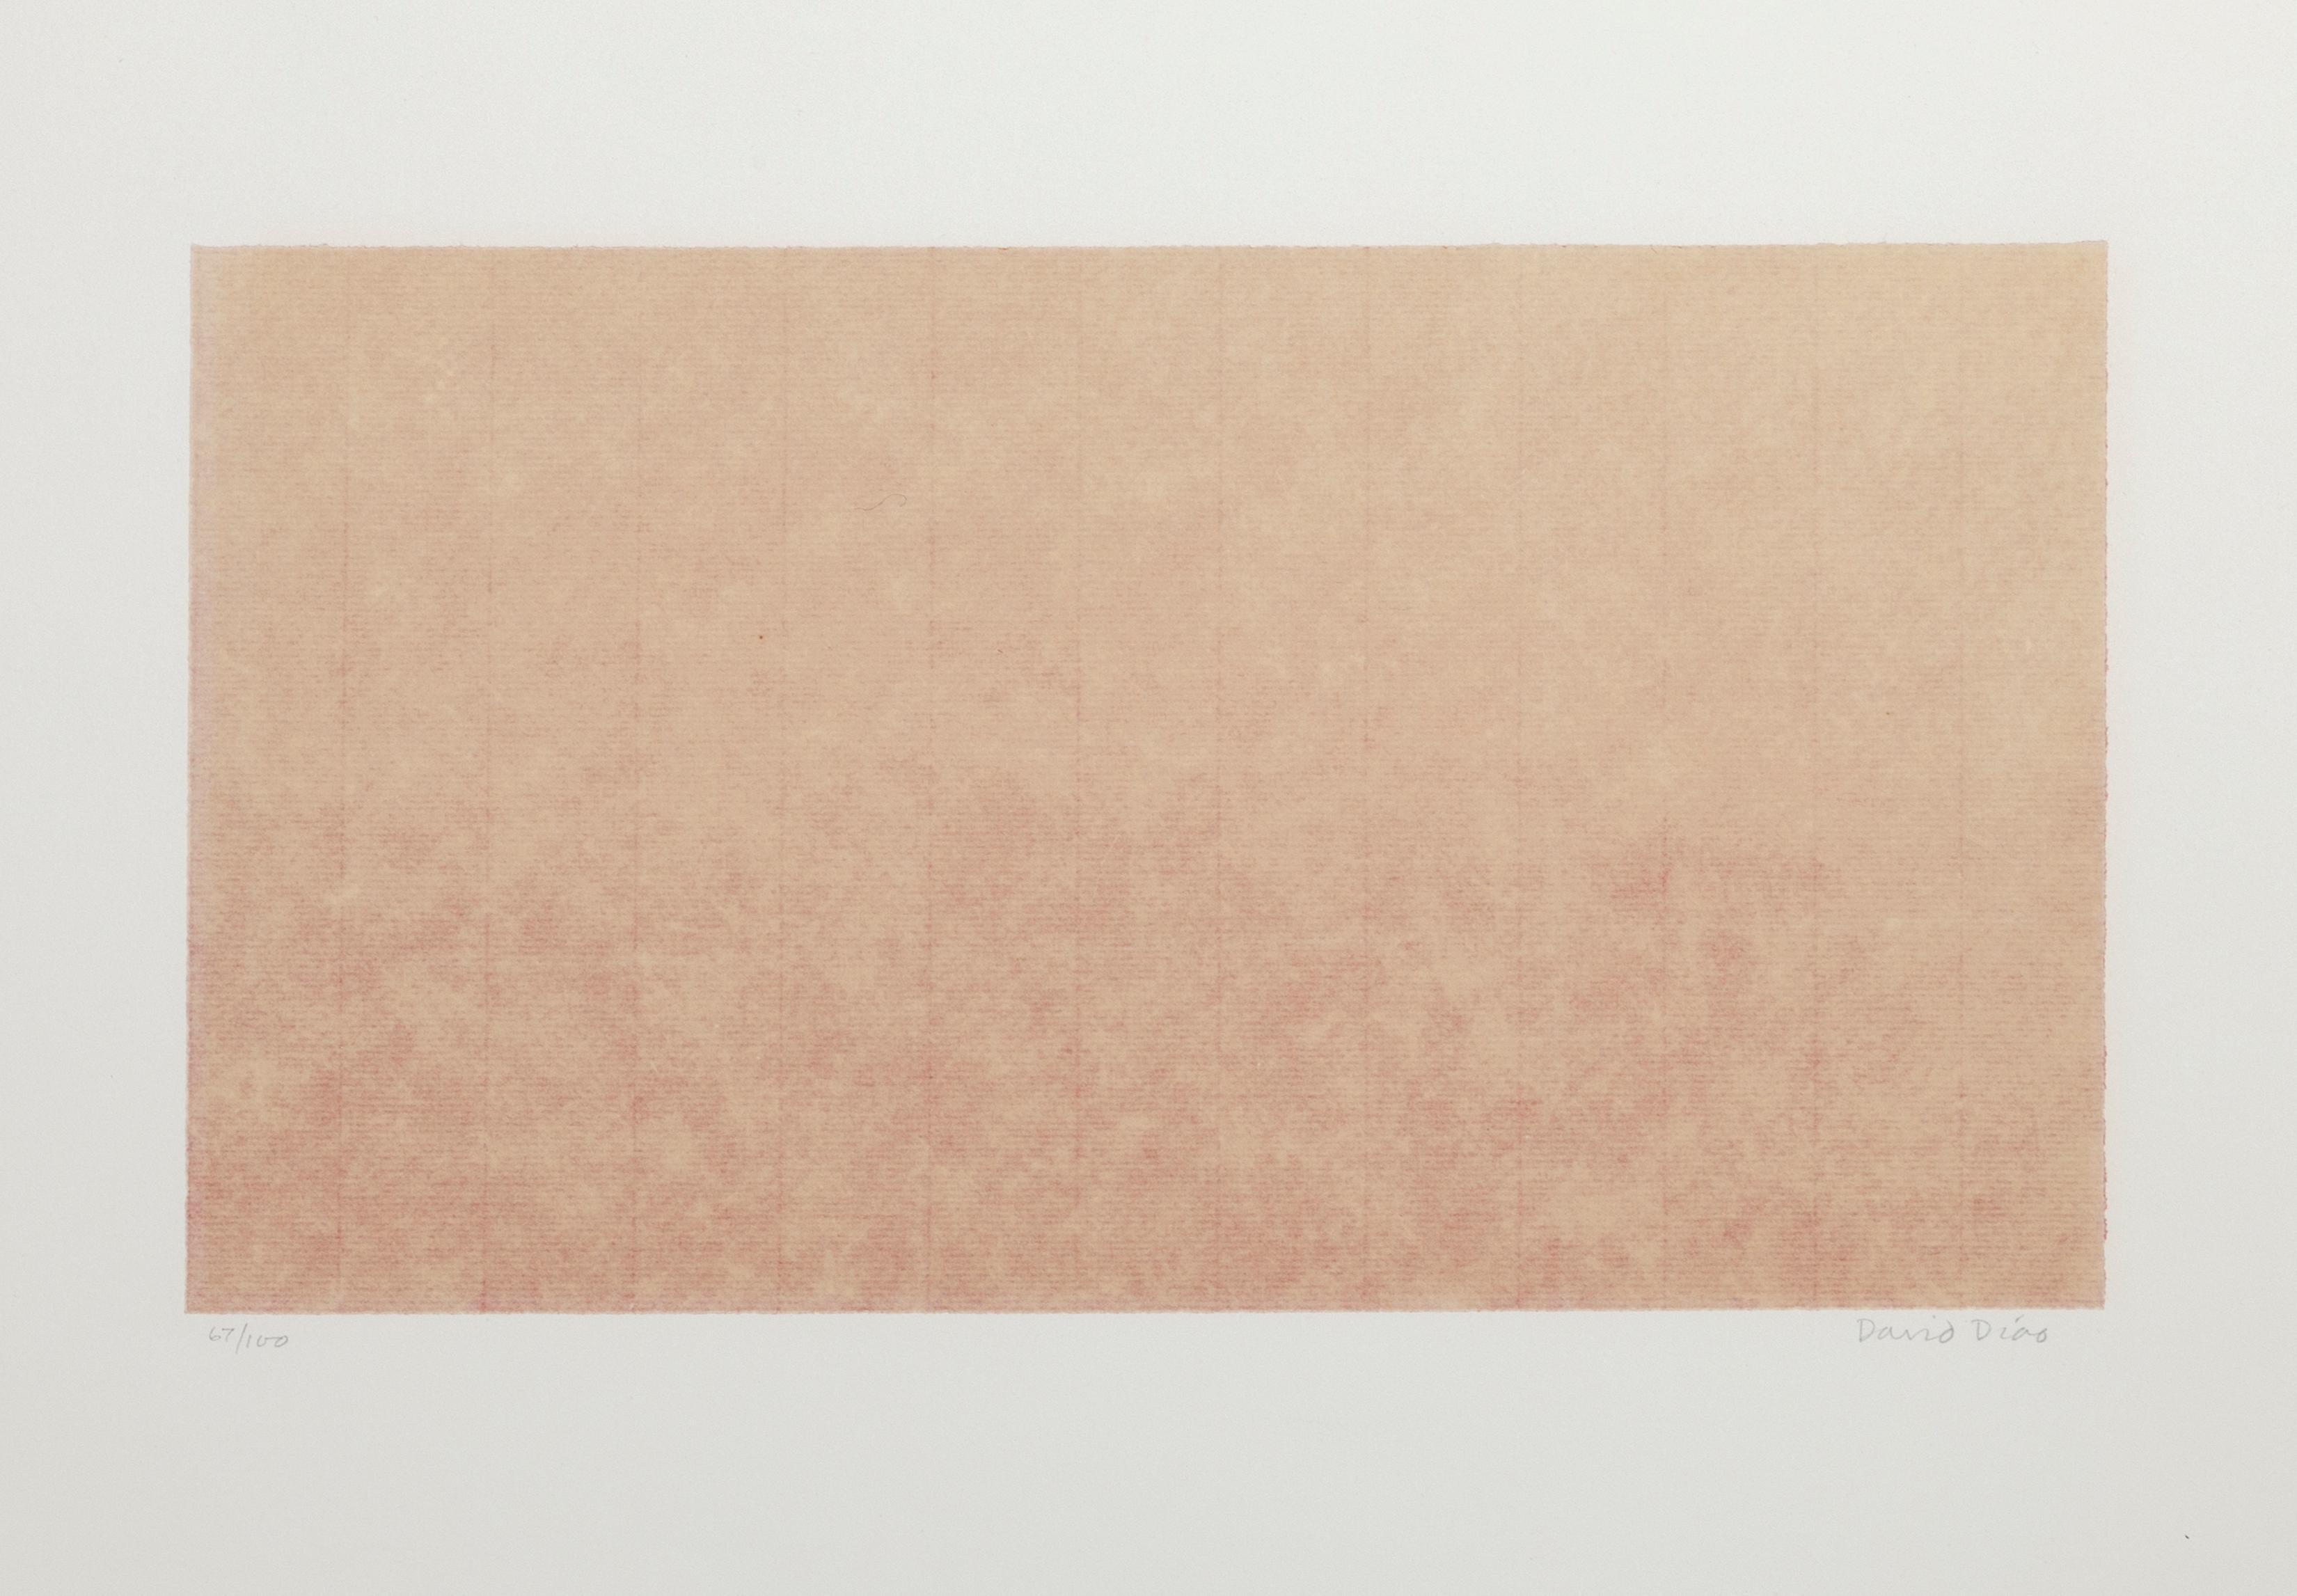 Minimalist Abstract from New York 10, David Diao 1969